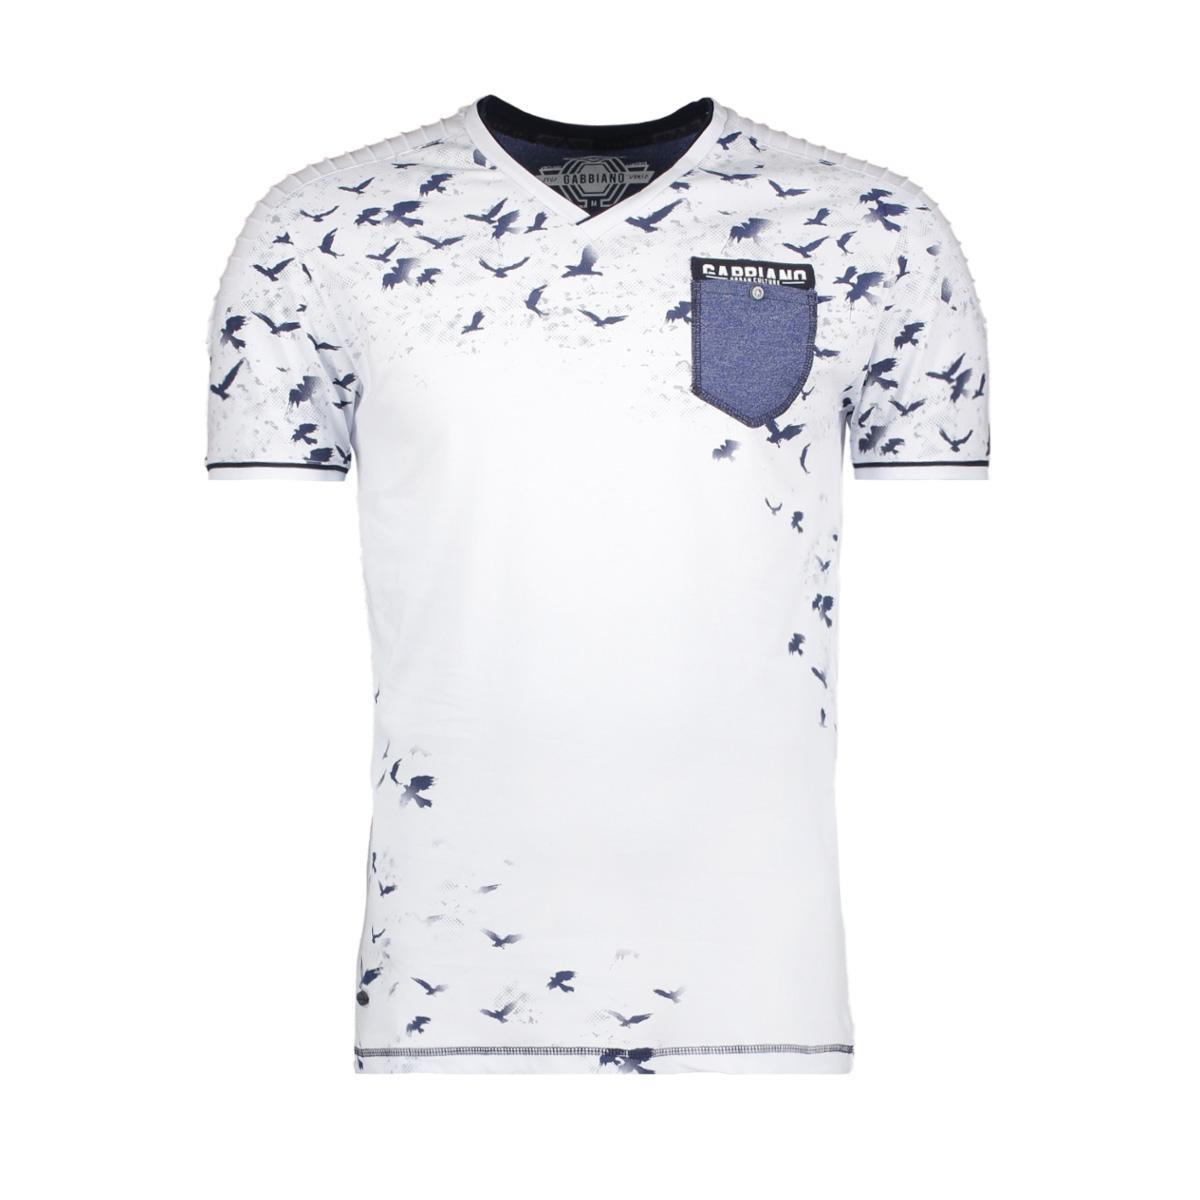 13876 gabbiano t-shirt white